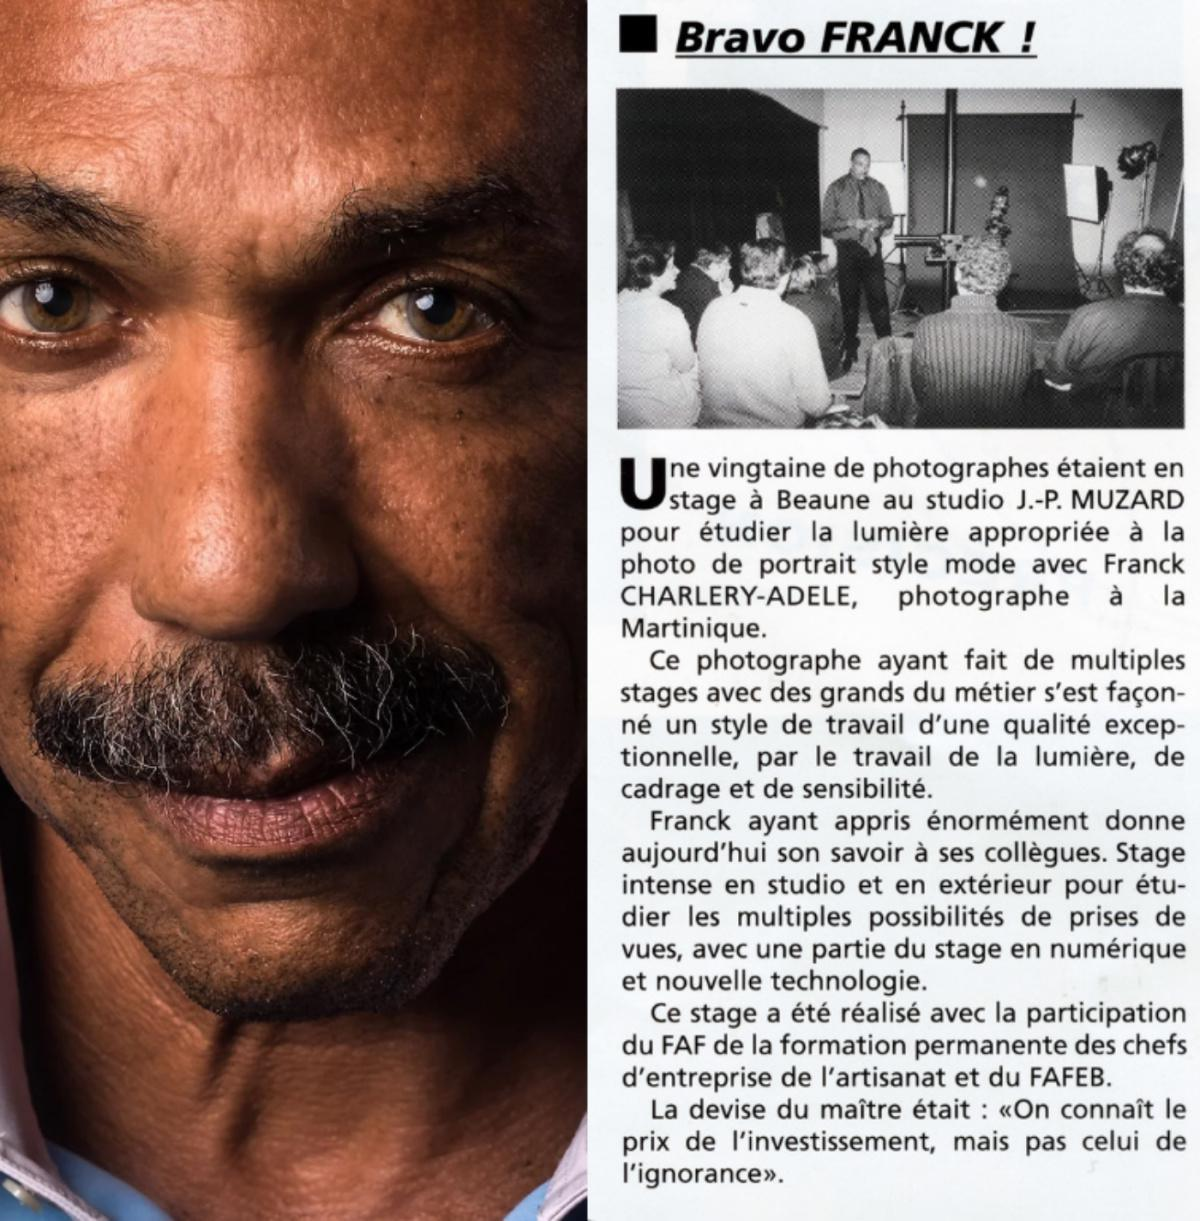 Franck Charlery-Adèle P H O T O G R A P H E